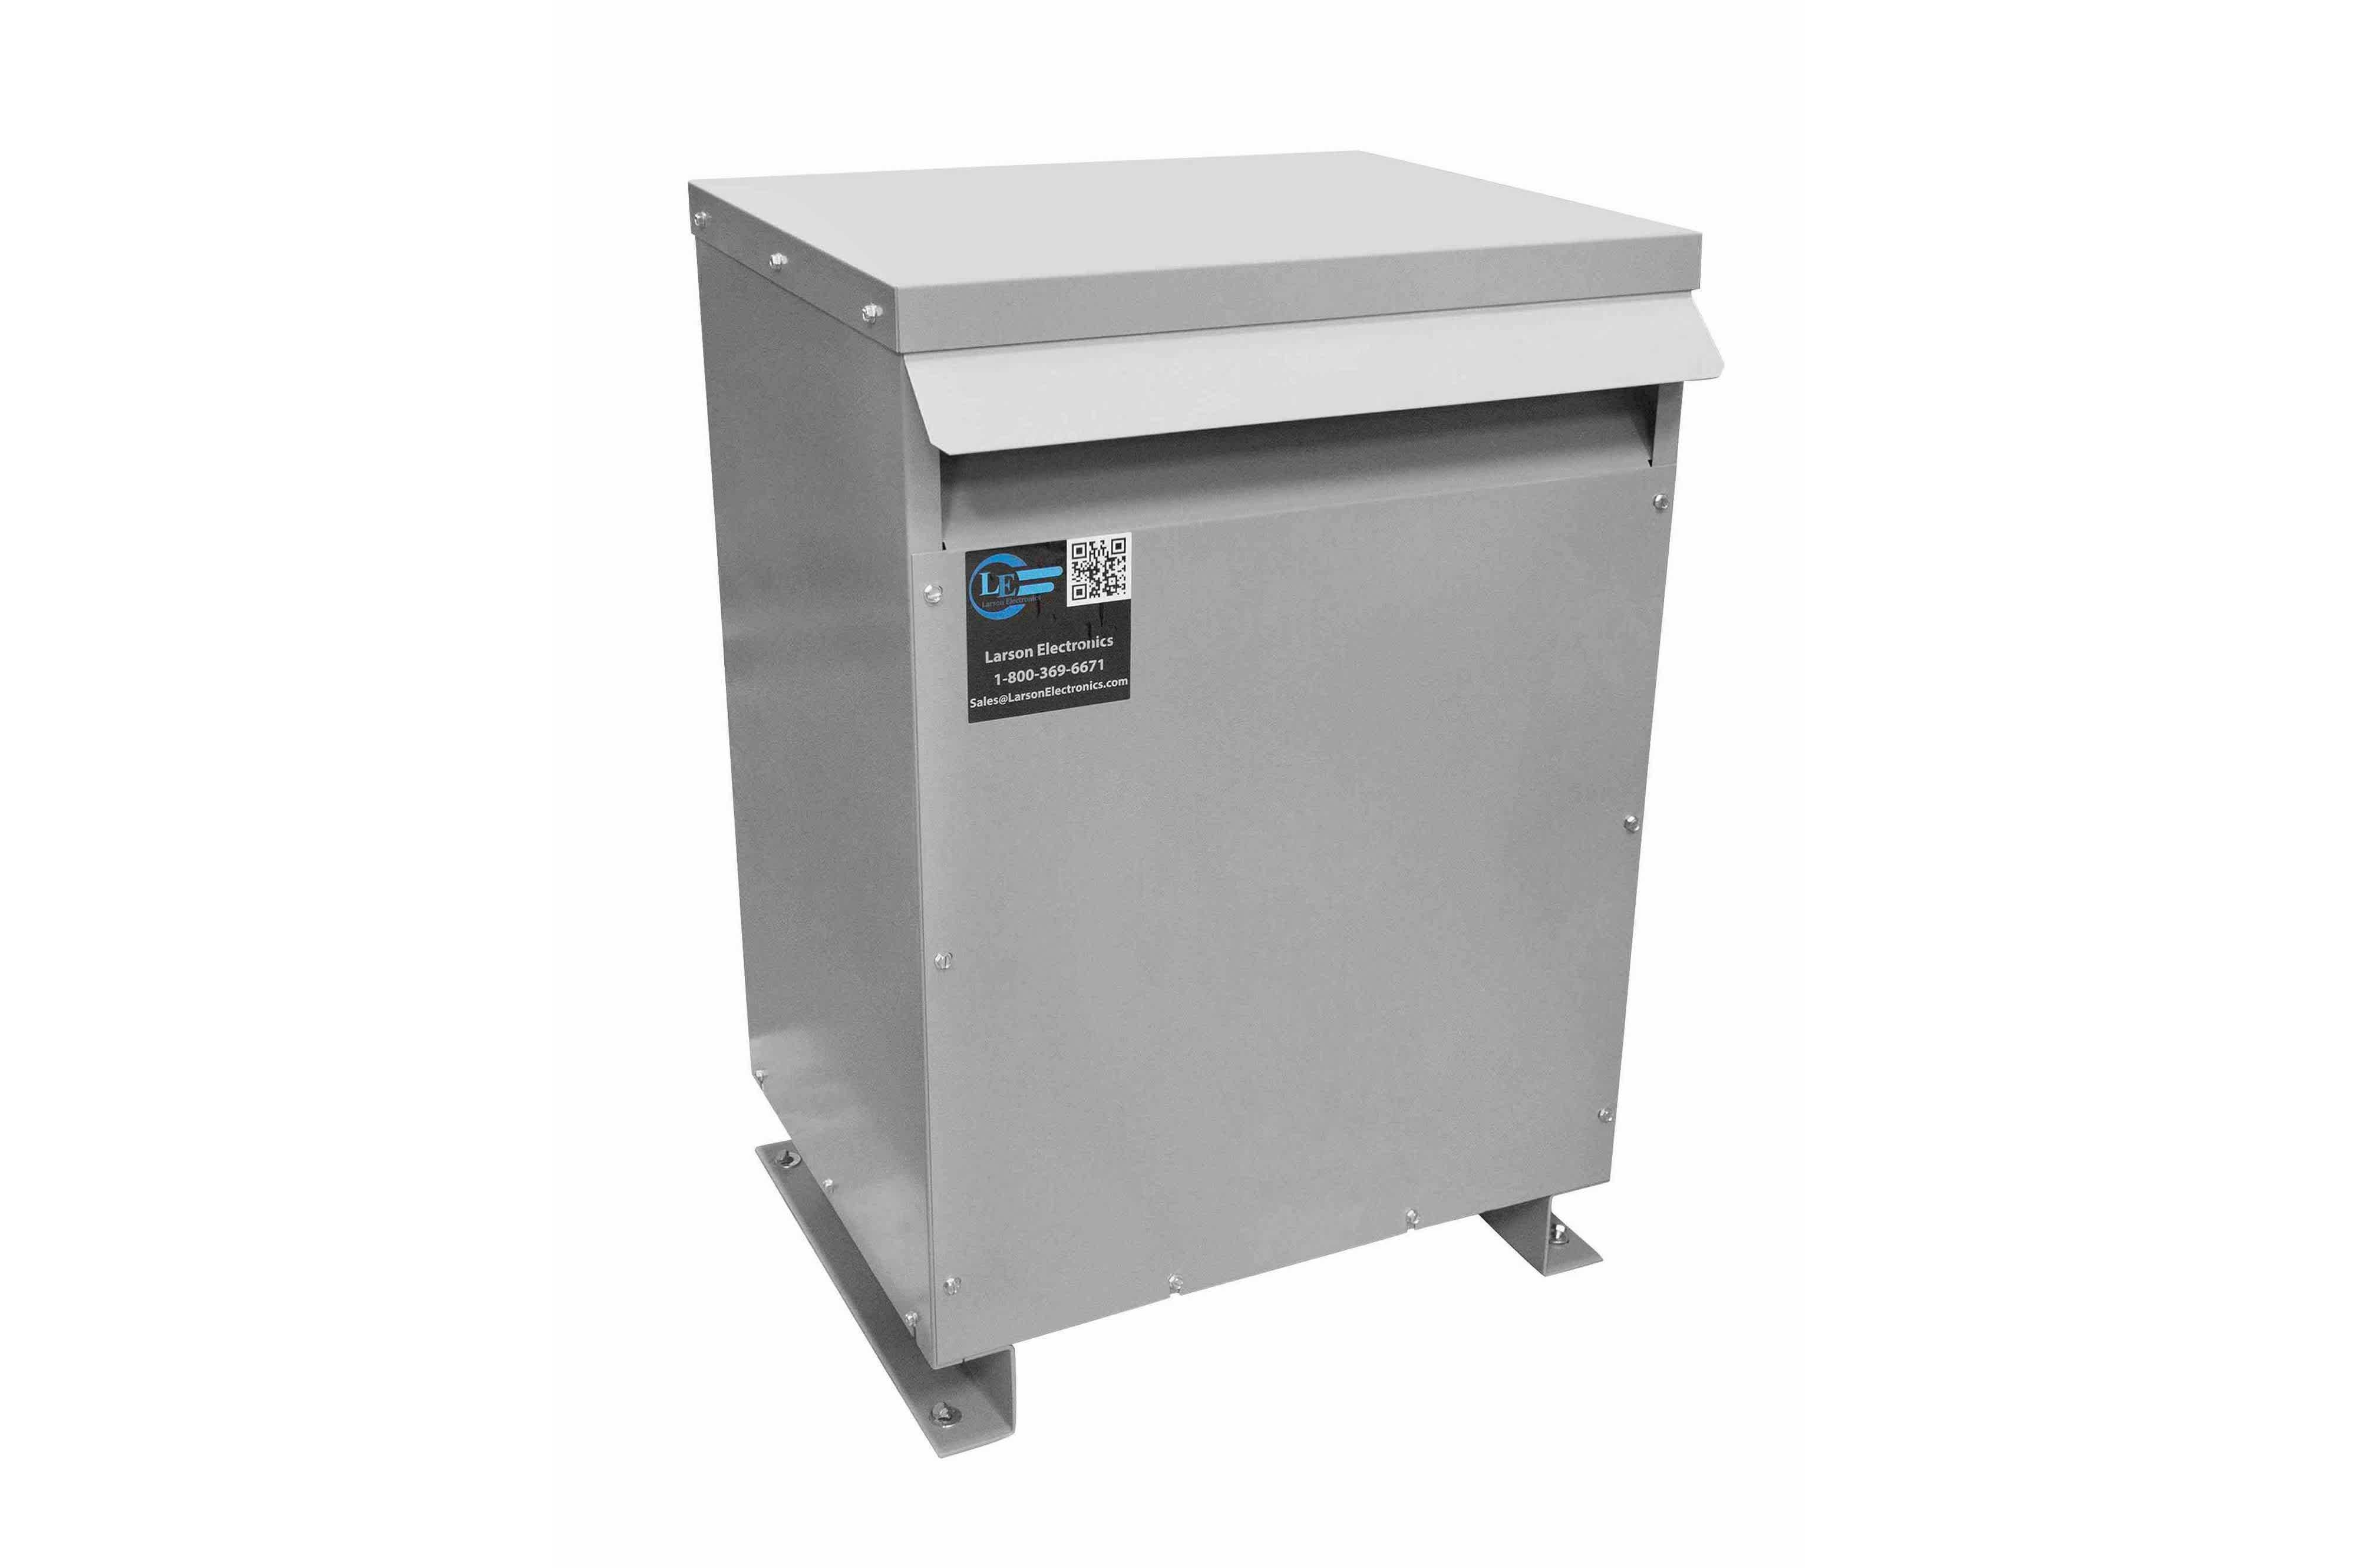 10 kVA 3PH Isolation Transformer, 240V Wye Primary, 380Y/220 Wye-N Secondary, N3R, Ventilated, 60 Hz